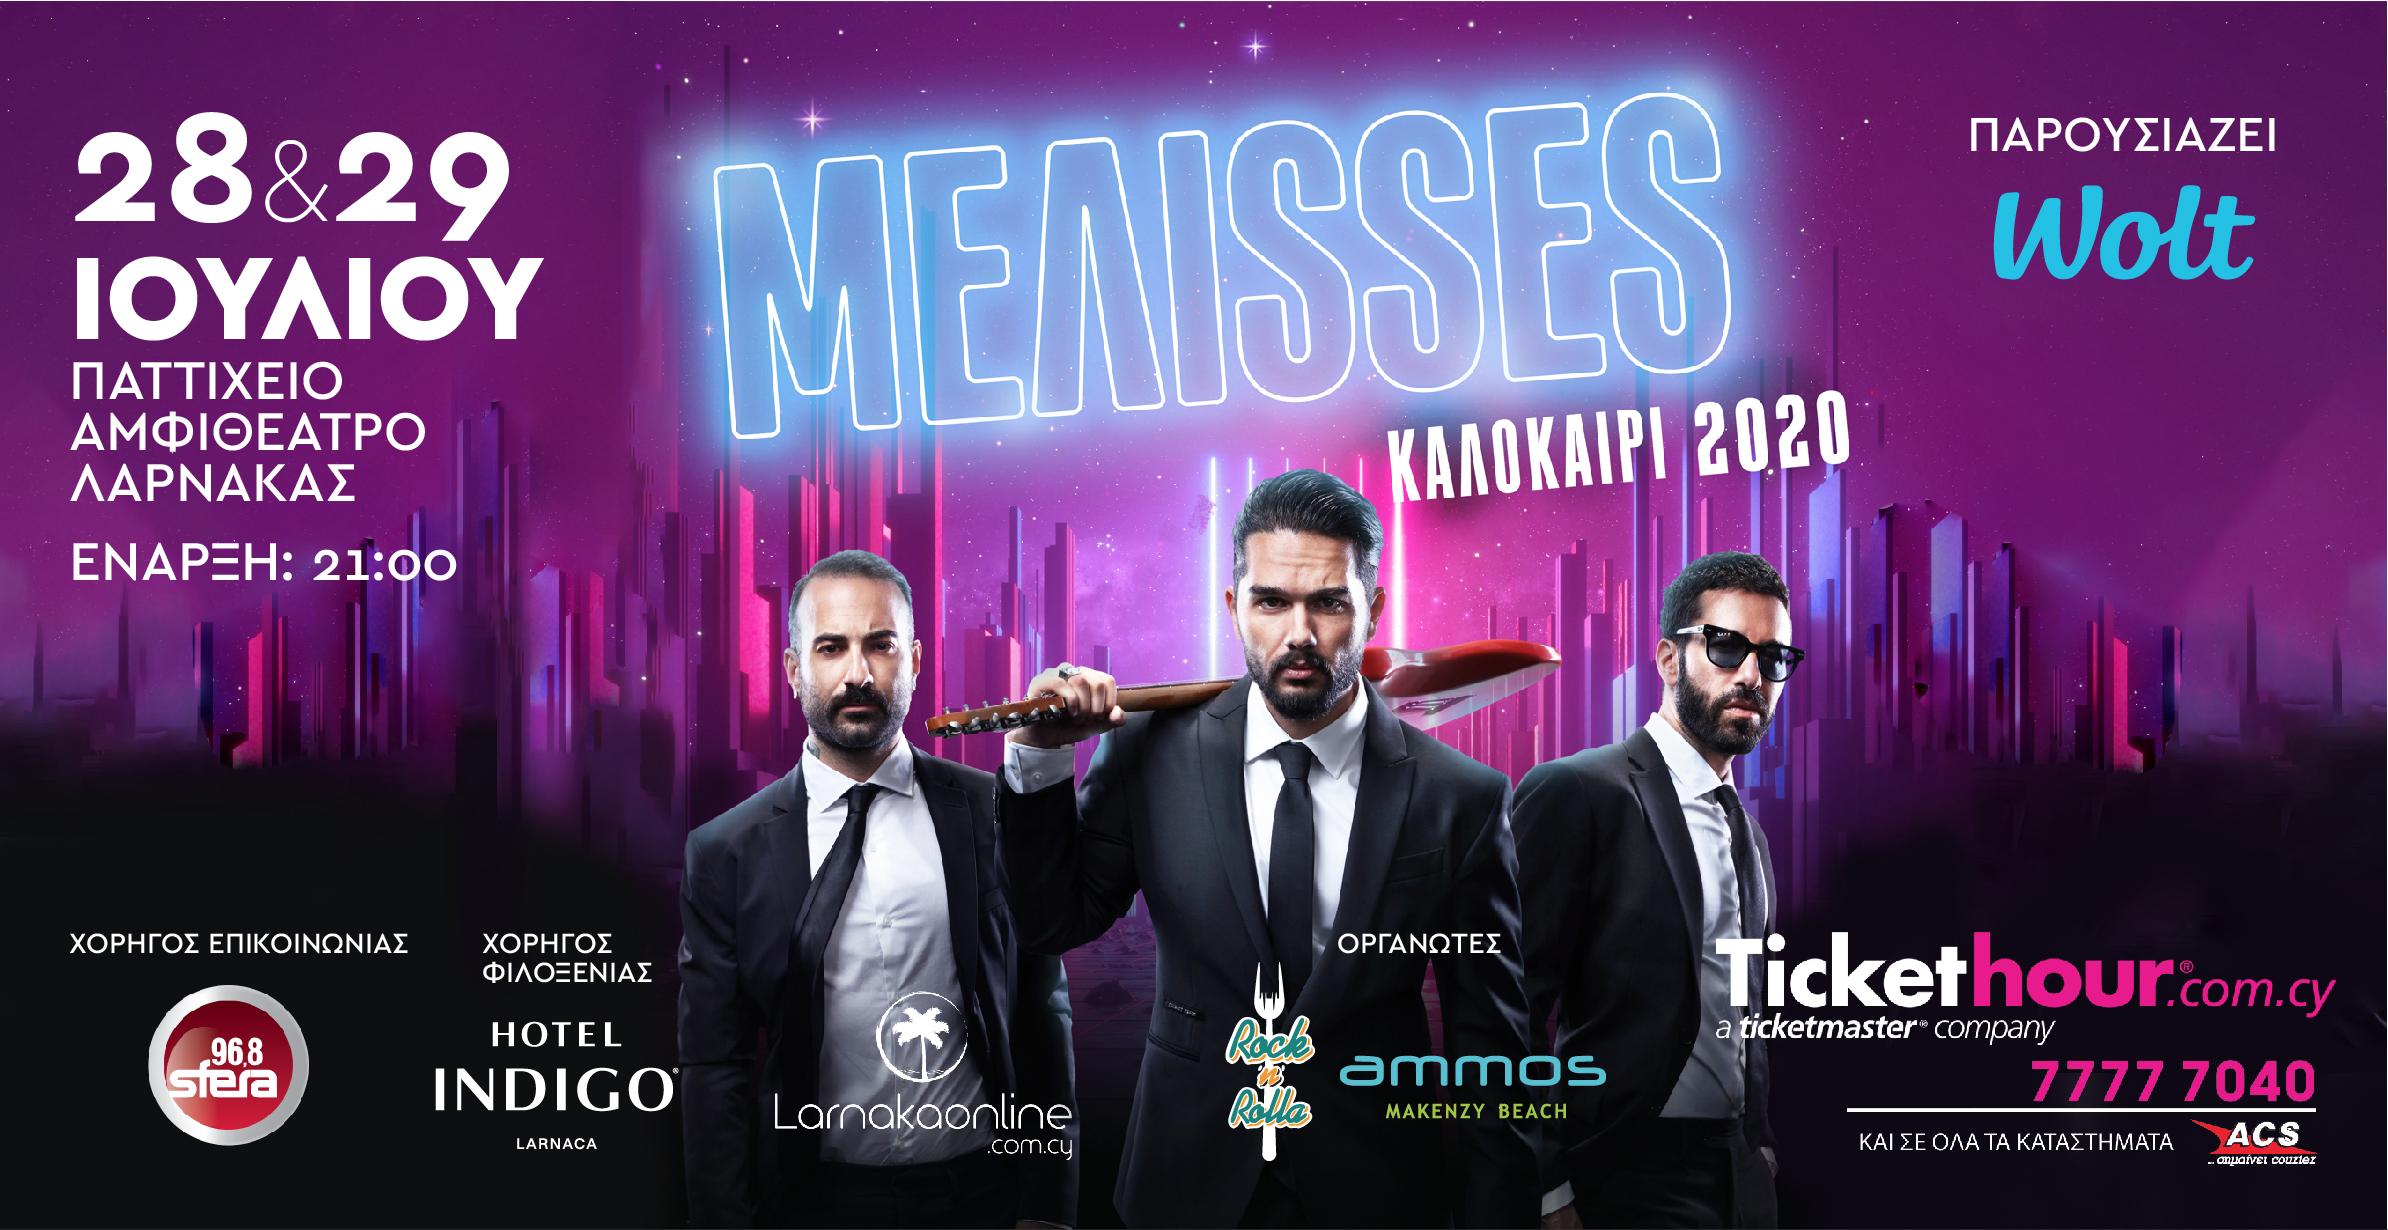 Melisses Live: Η αντίστροφη μέτρηση για τη μεγάλη συναυλία ξεκίνησε – Περιορισμένος αριθμός θέσεων